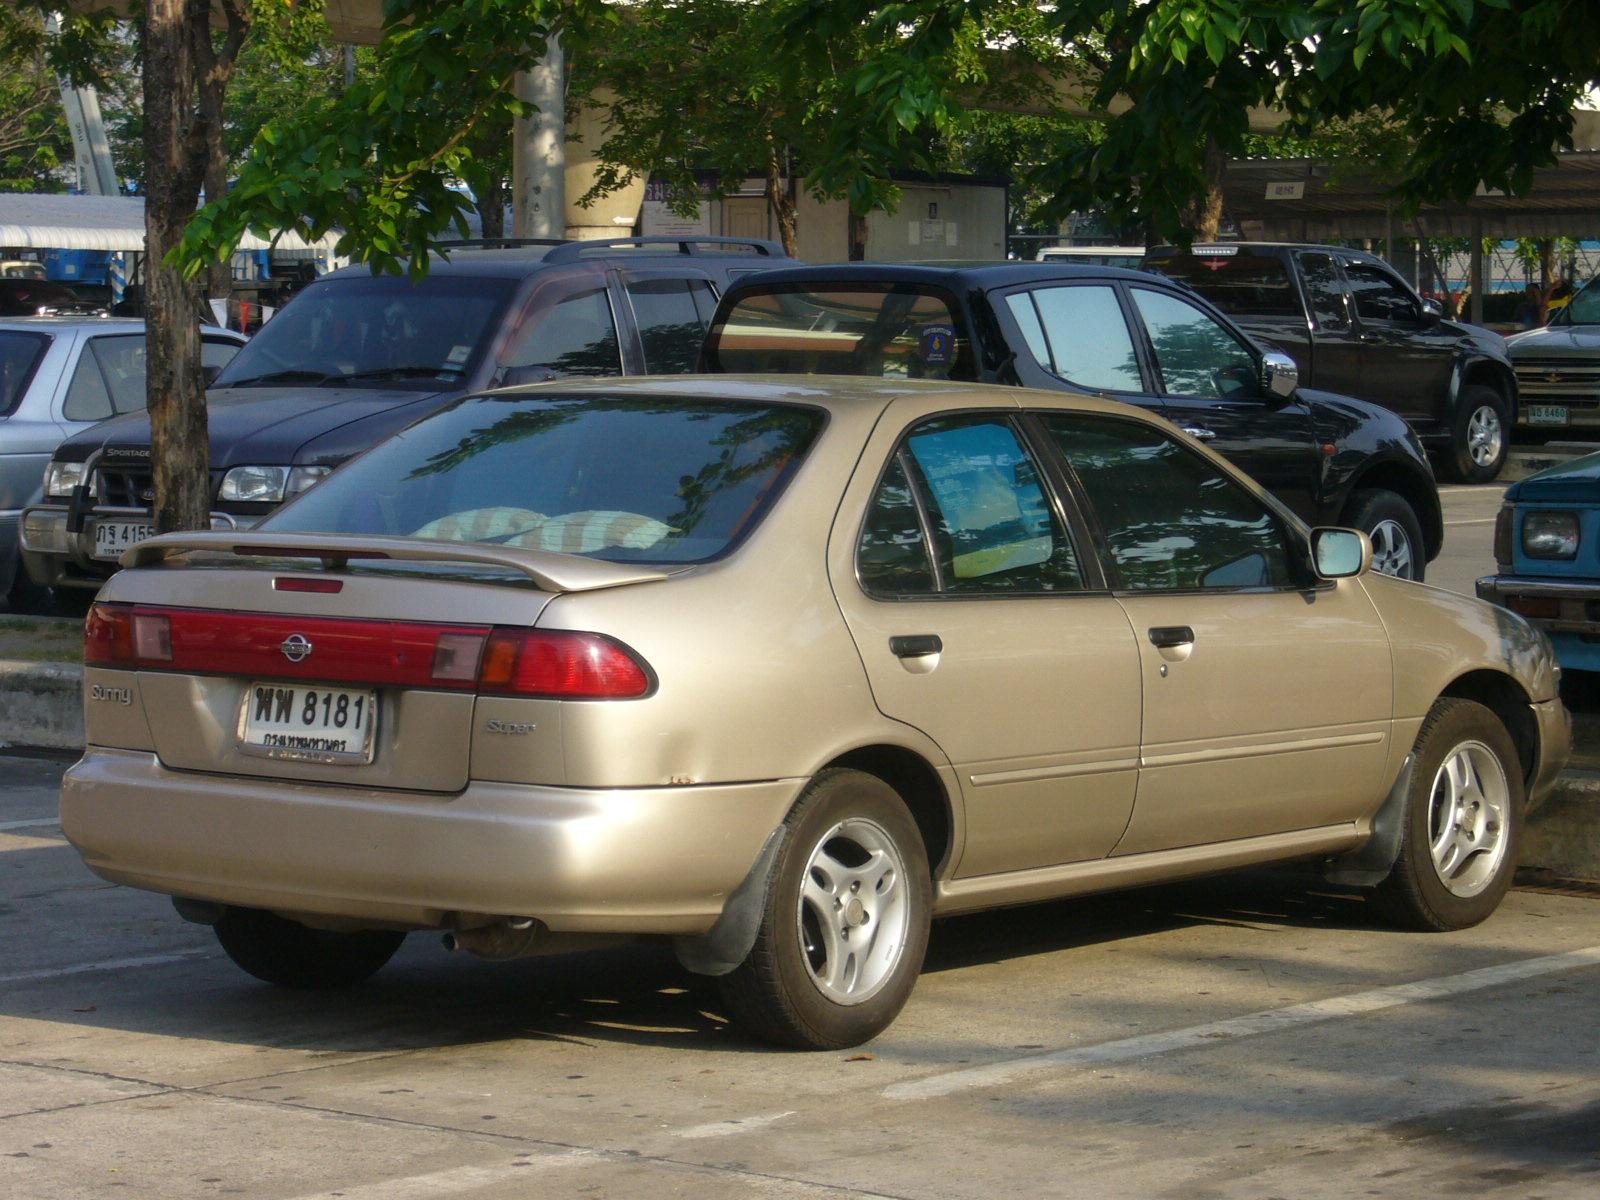 P1100546.JPG